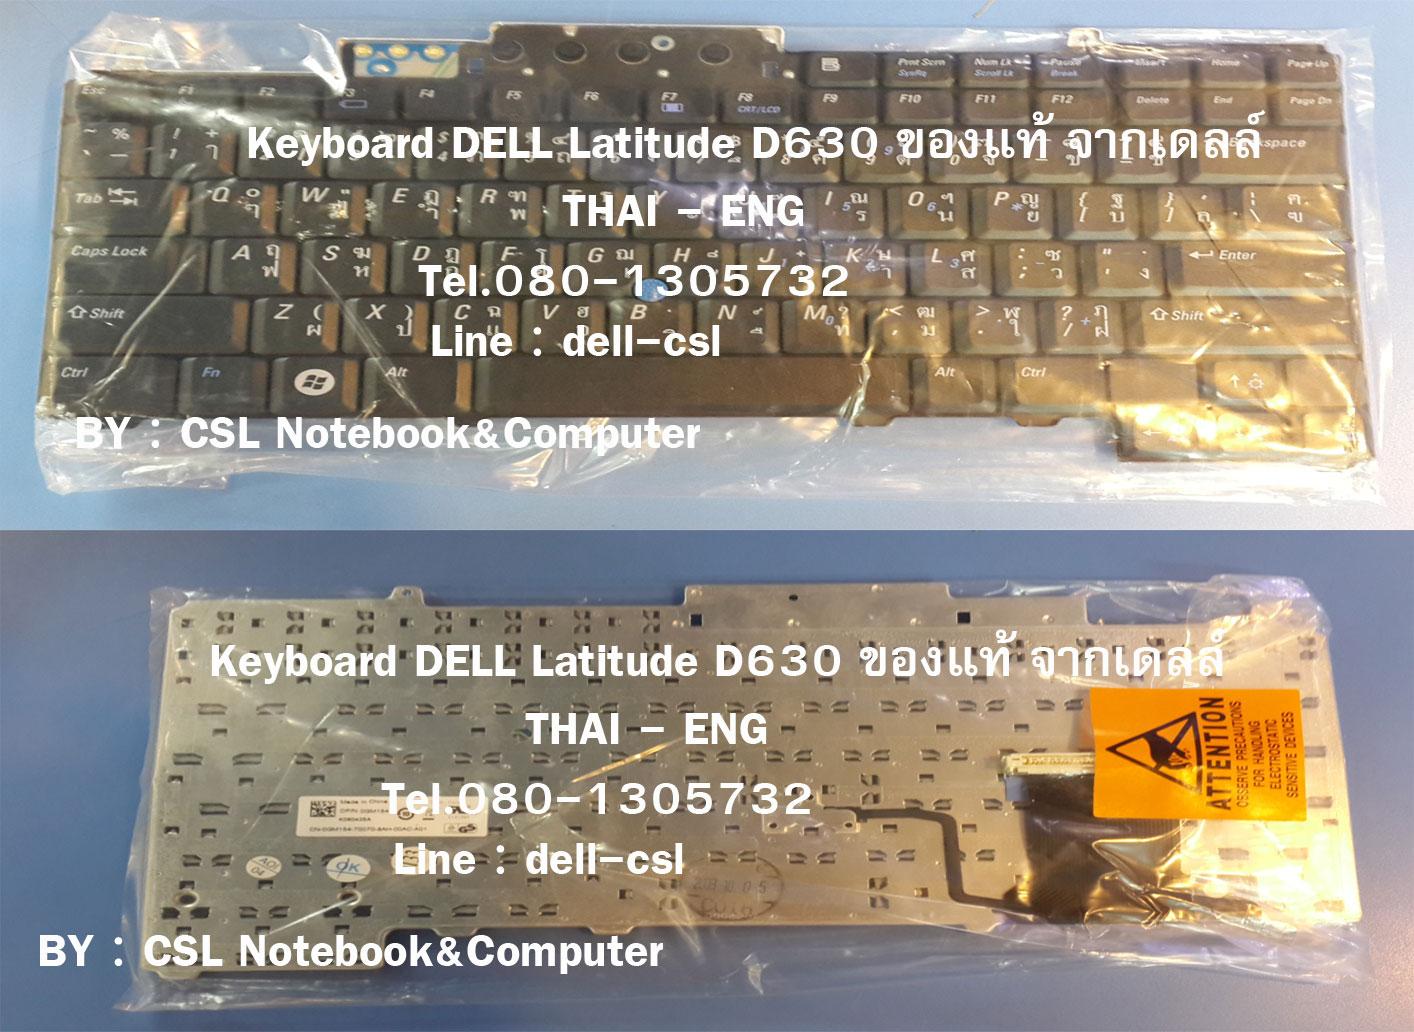 Keyboard DELL Latitude D630 ของแท้ ประกันศูนย์